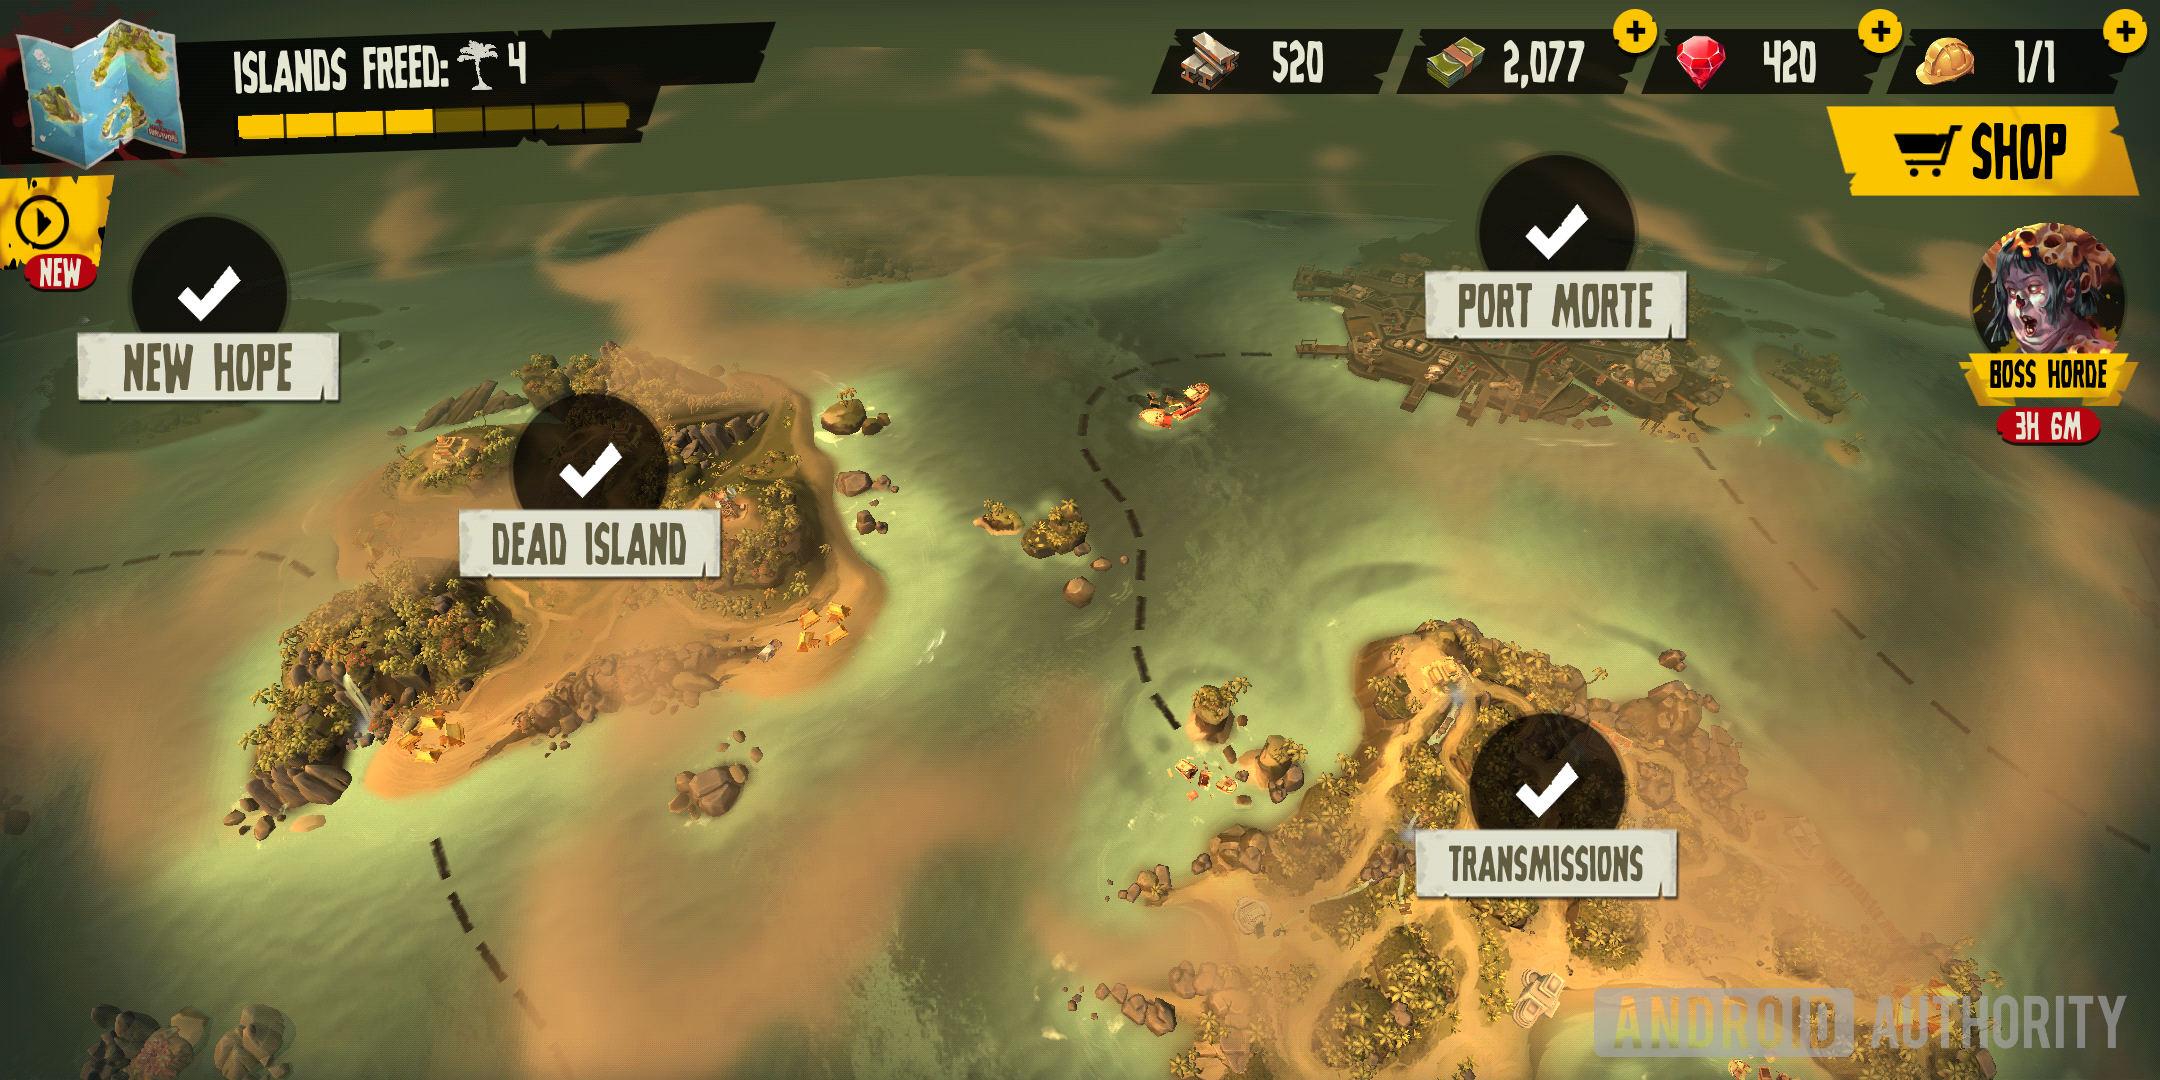 Dead Island Map on